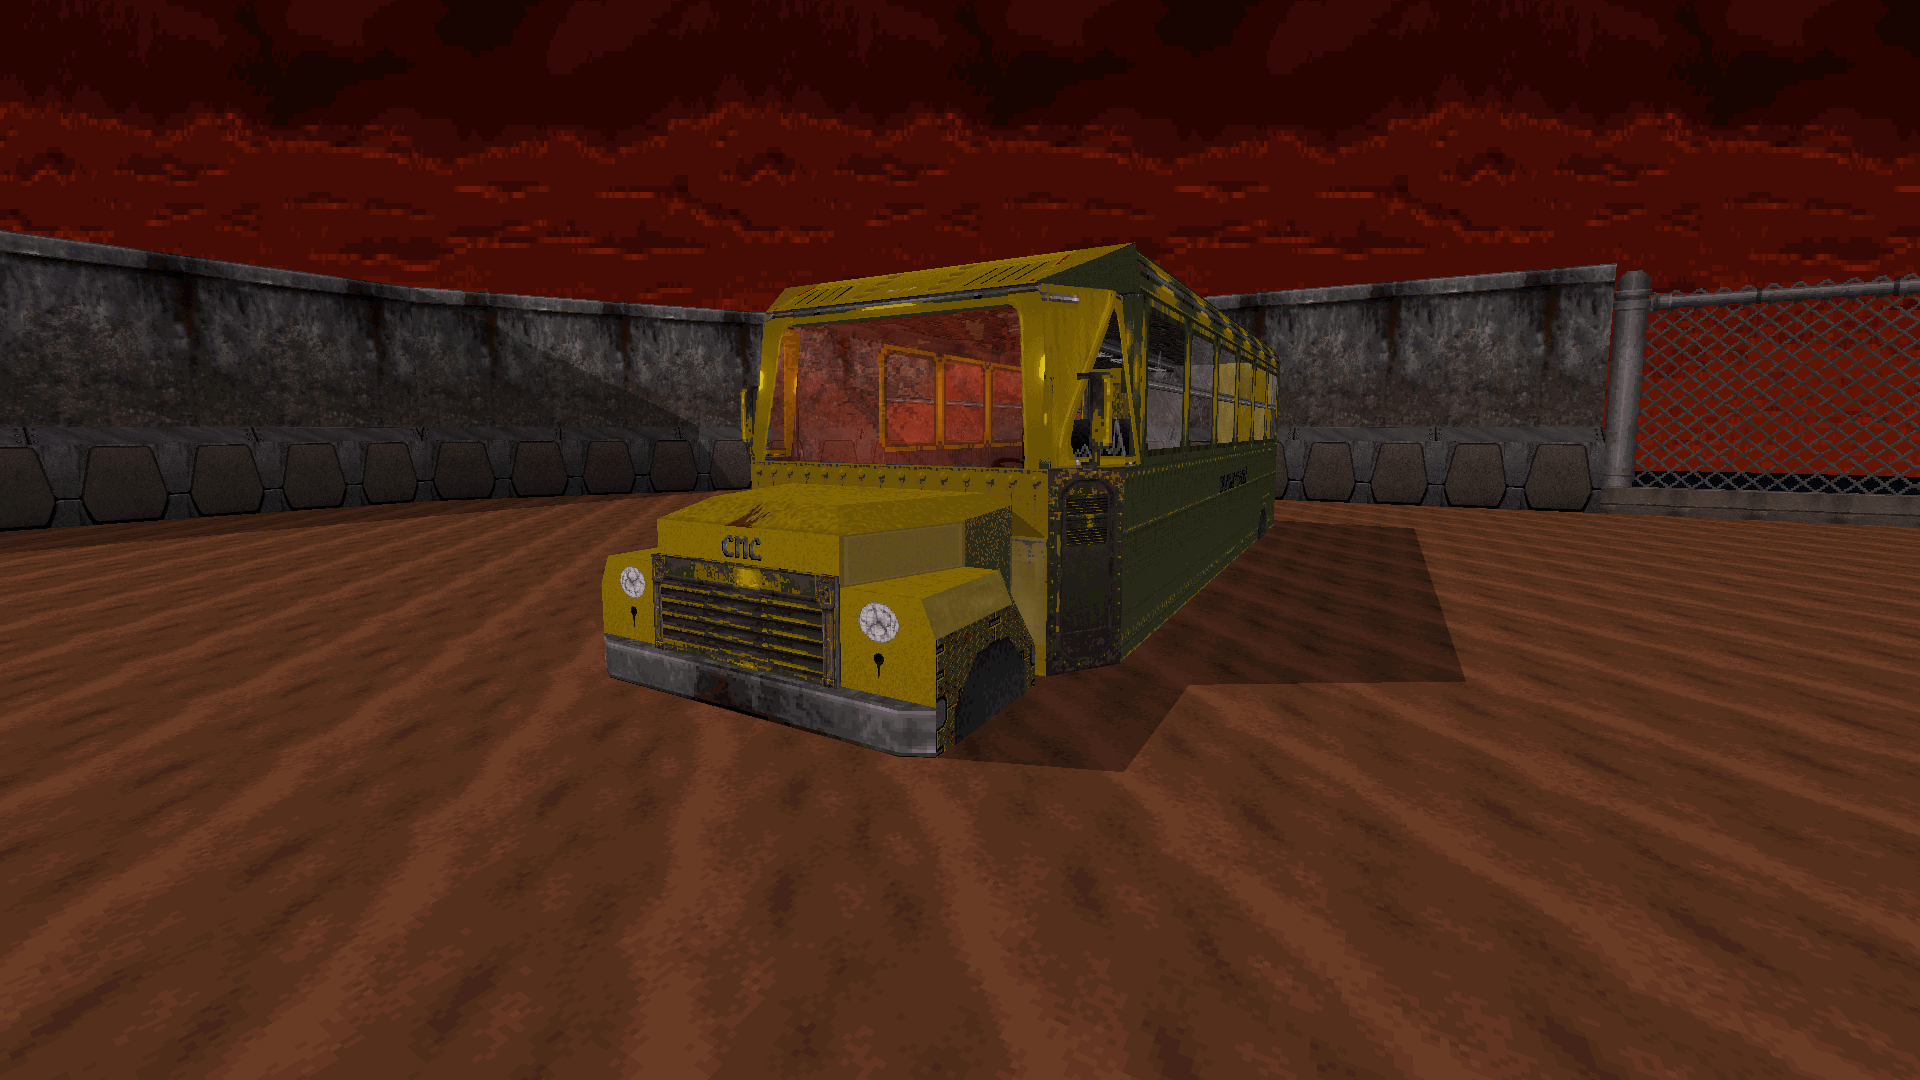 Yellow bus in Piggish Prison